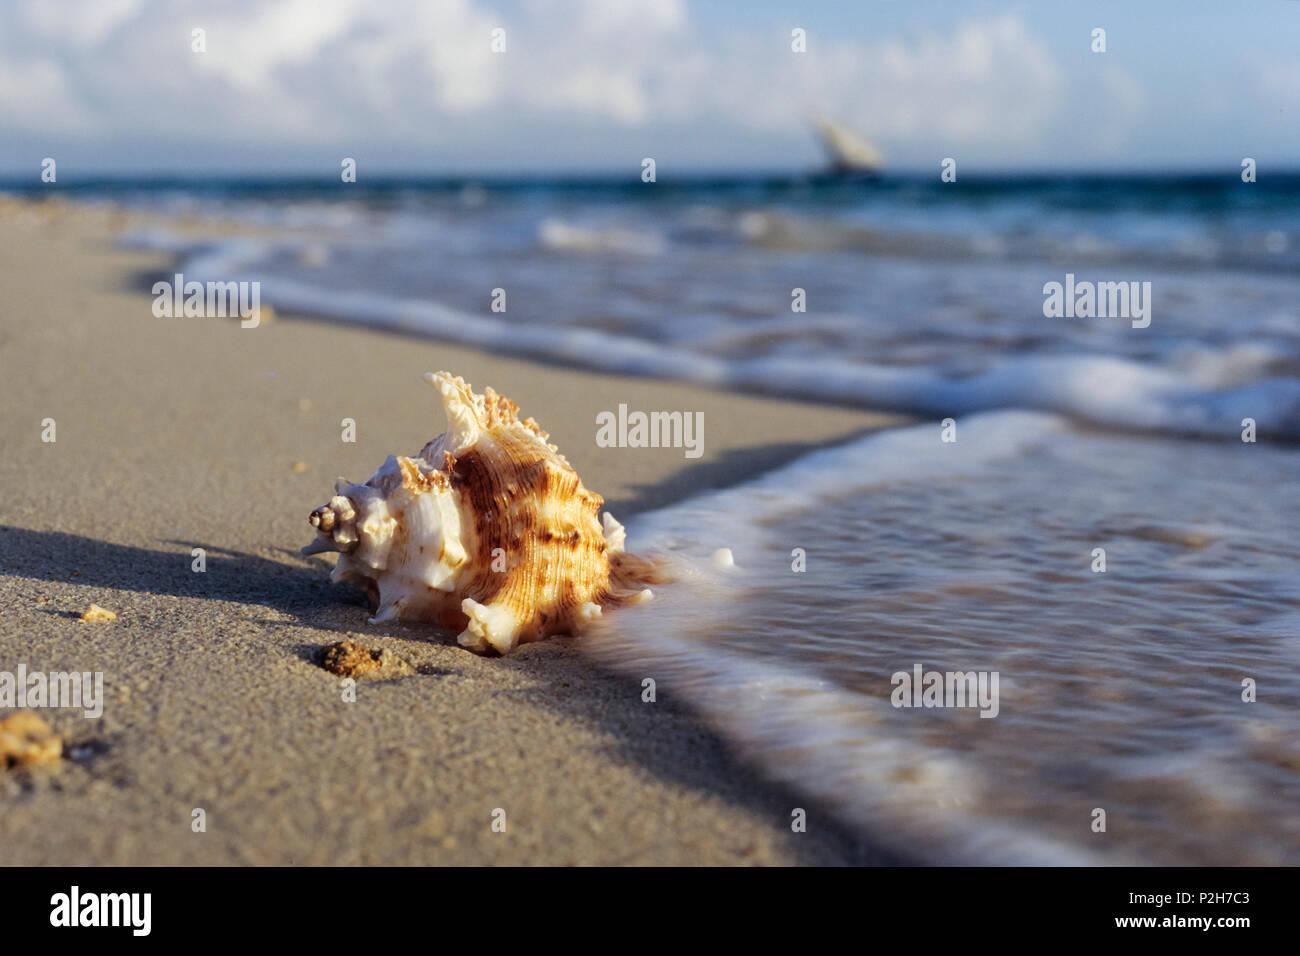 Snail shell on the beach, Zanzibar, Tanzania, East-Africa - Stock Image